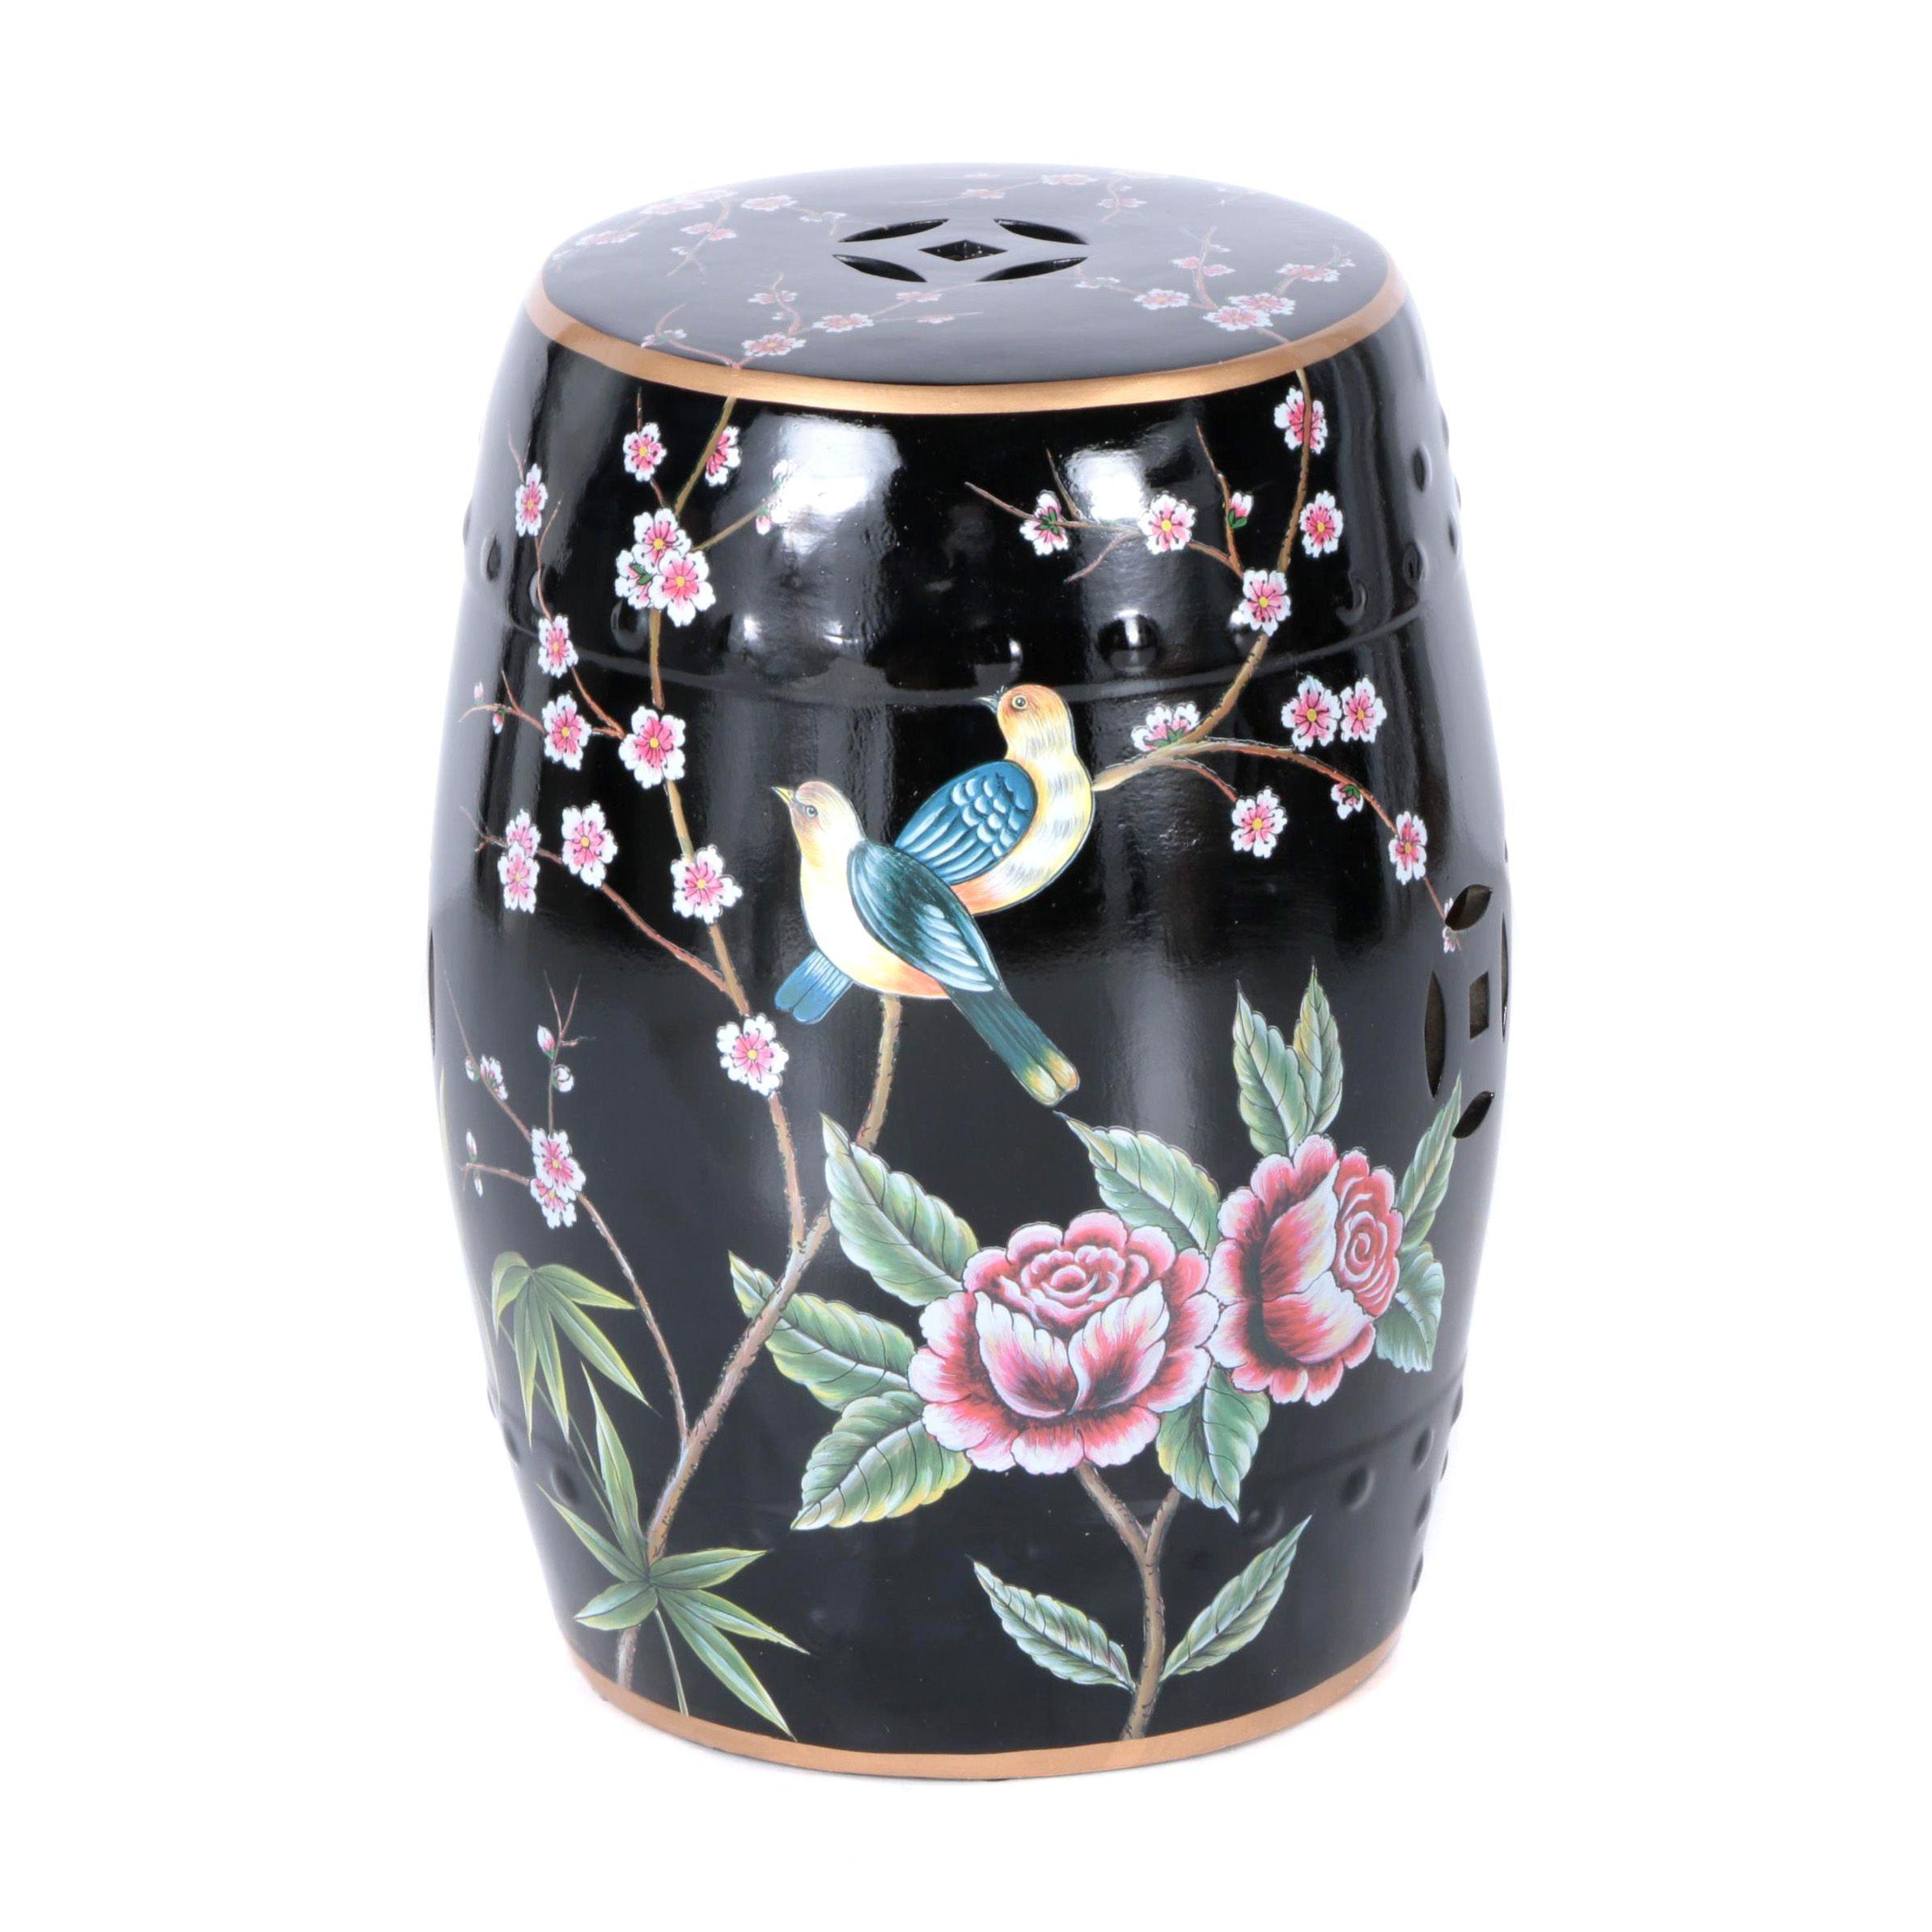 Floral Themed Black Ceramic Garden Stool ...